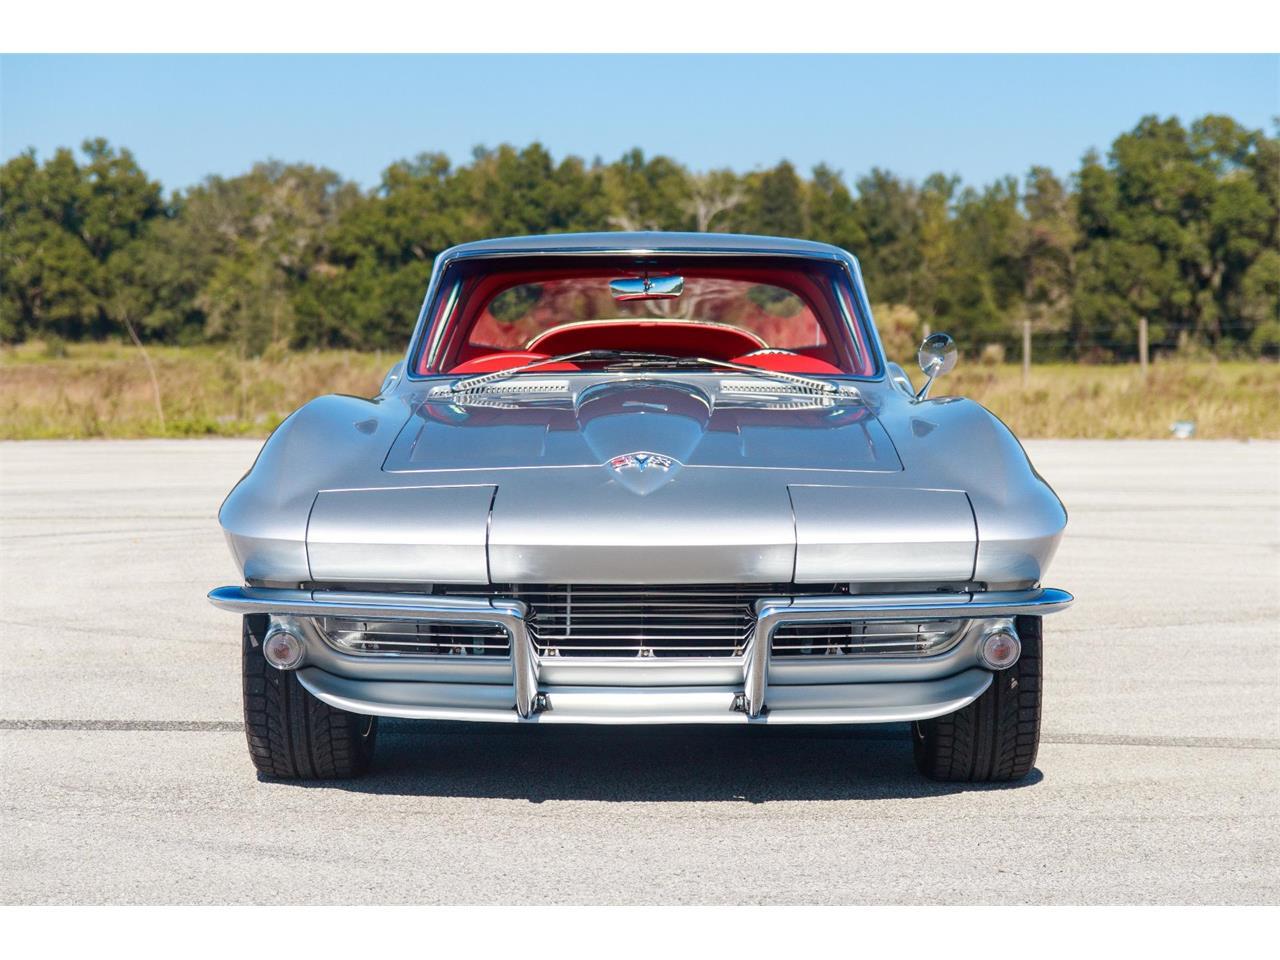 1964 Chevrolet Corvette Stingray (CC-1355468) for sale in Ocala, Florida